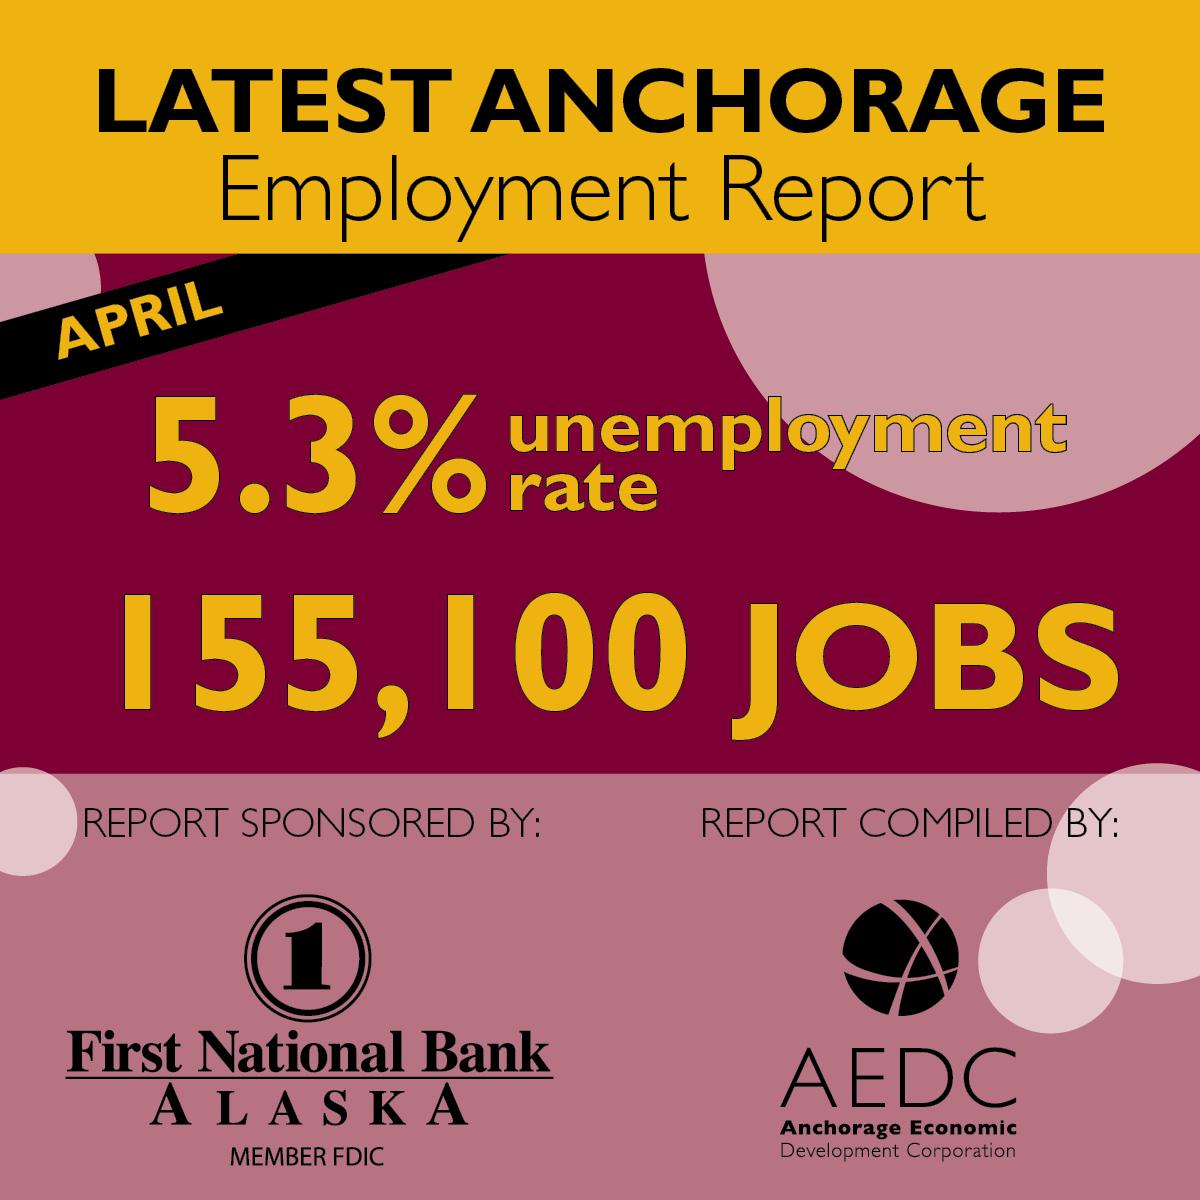 Anchorage Employment Report: Third Edition 2015